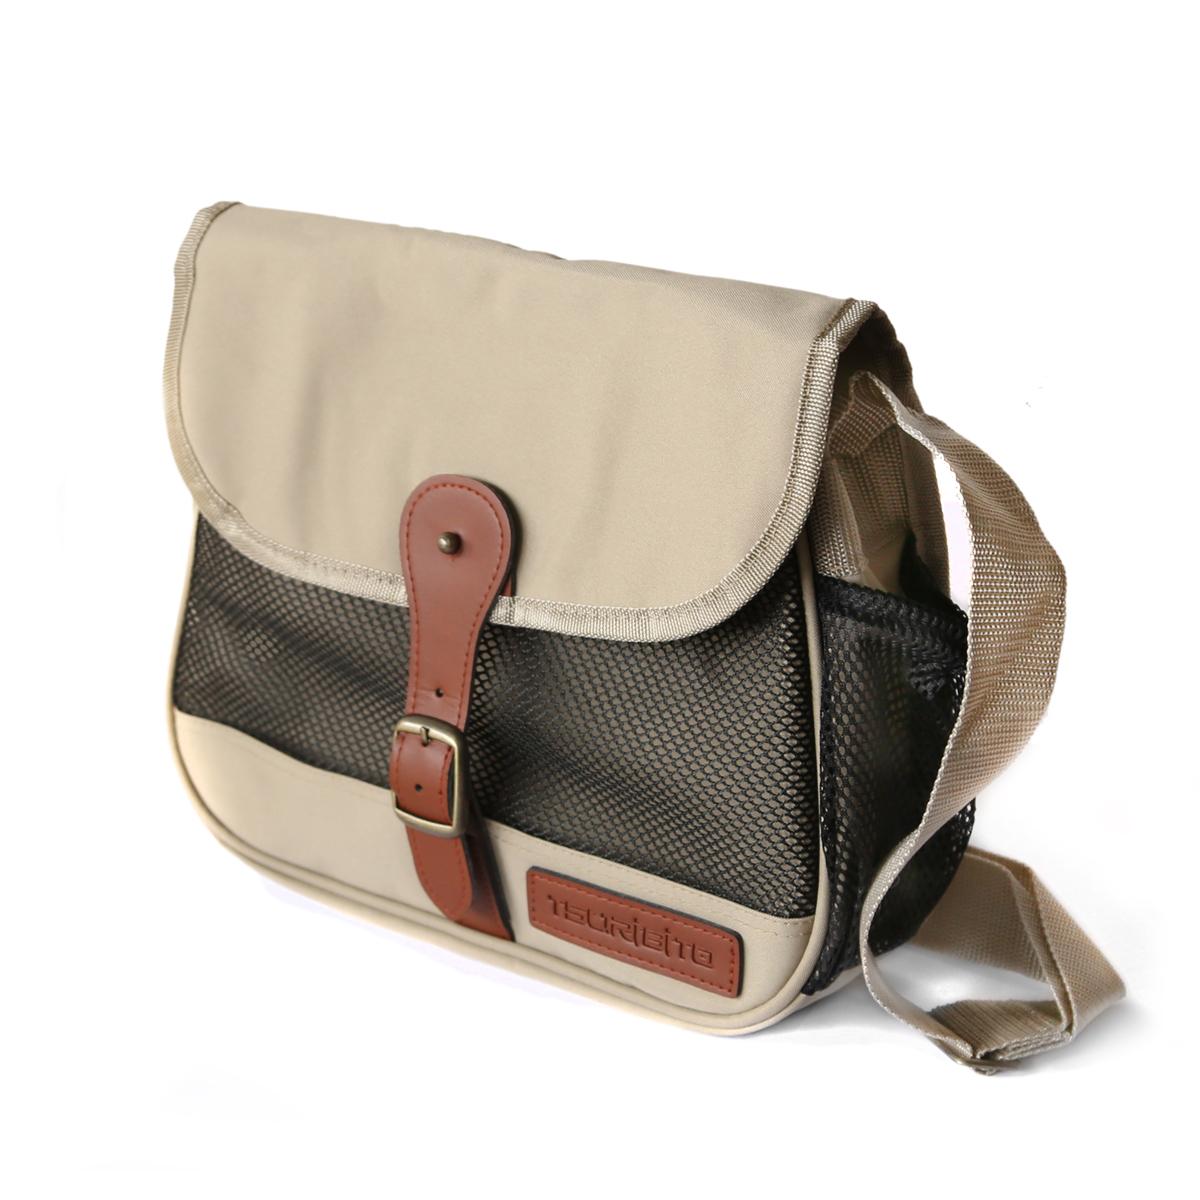 Сумка Tsuribito Shoulder Bag, для хранения коробок с приманками. Размер M bloomingville сумка для хранения plus